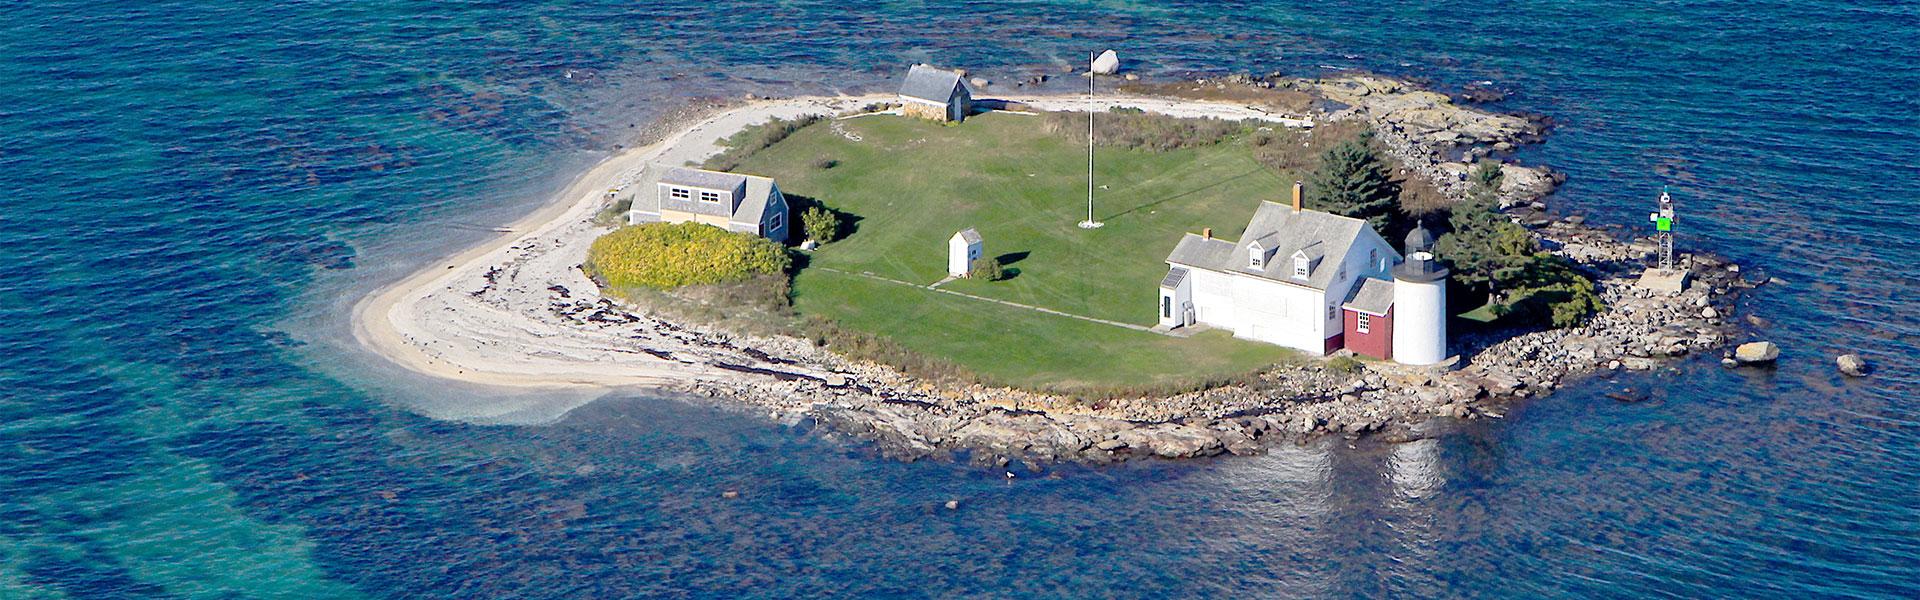 Inselarchiv - Green Island - Maine - USA